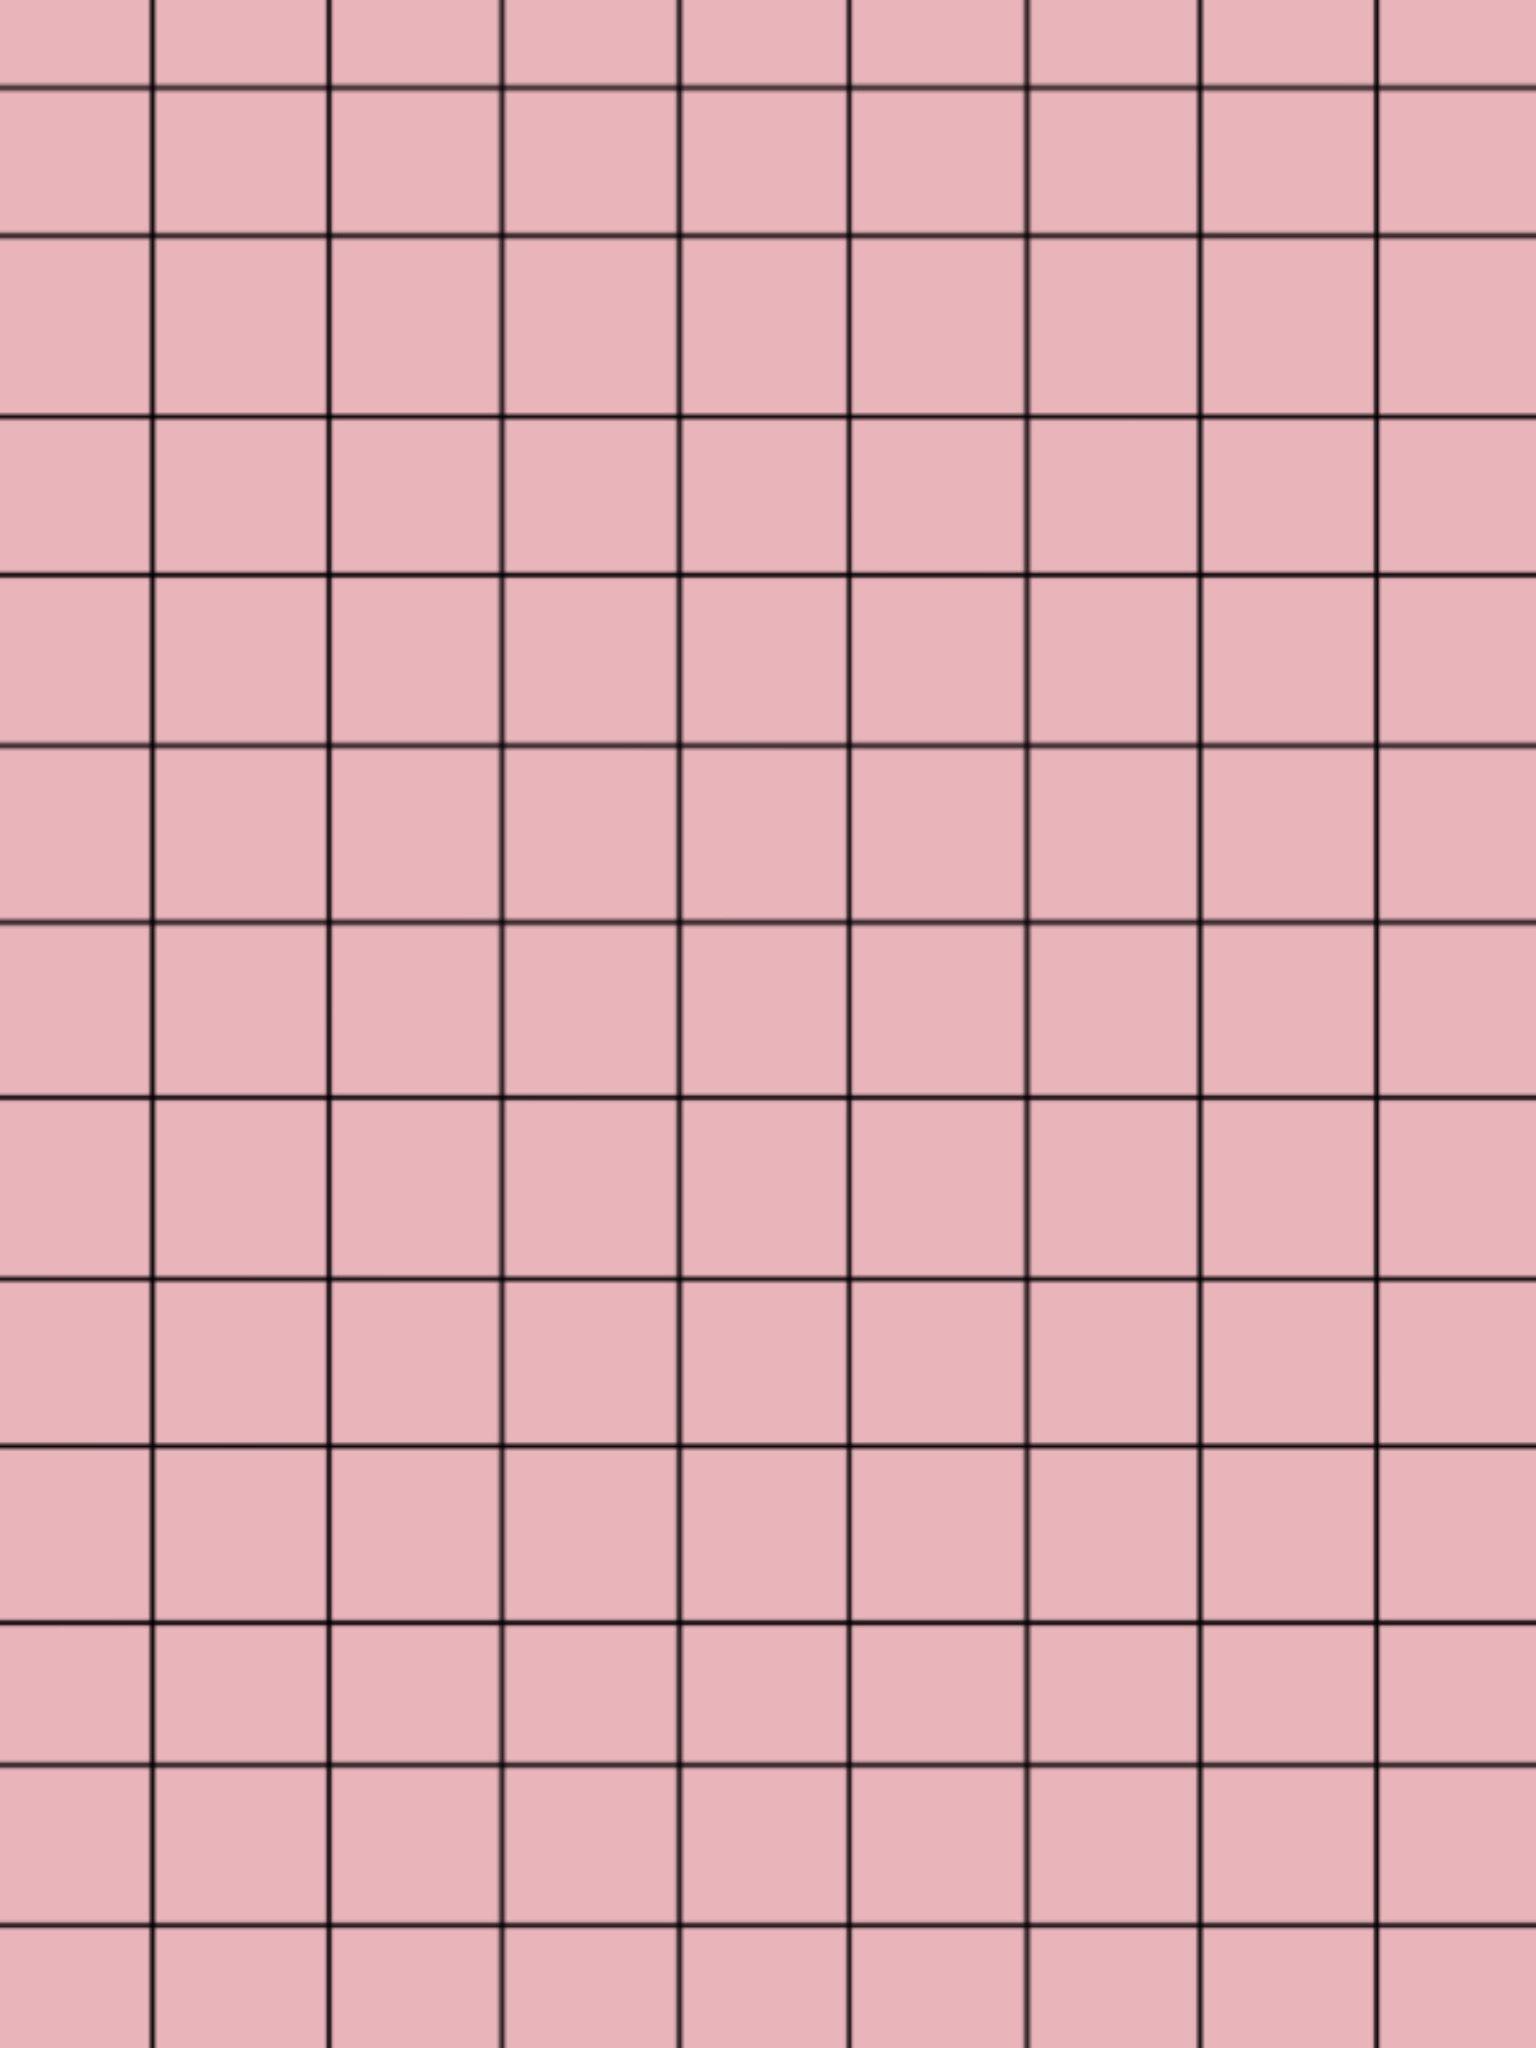 Pink Aesthetic Grid Wallpapers   Top Free Pink Aesthetic Grid ...